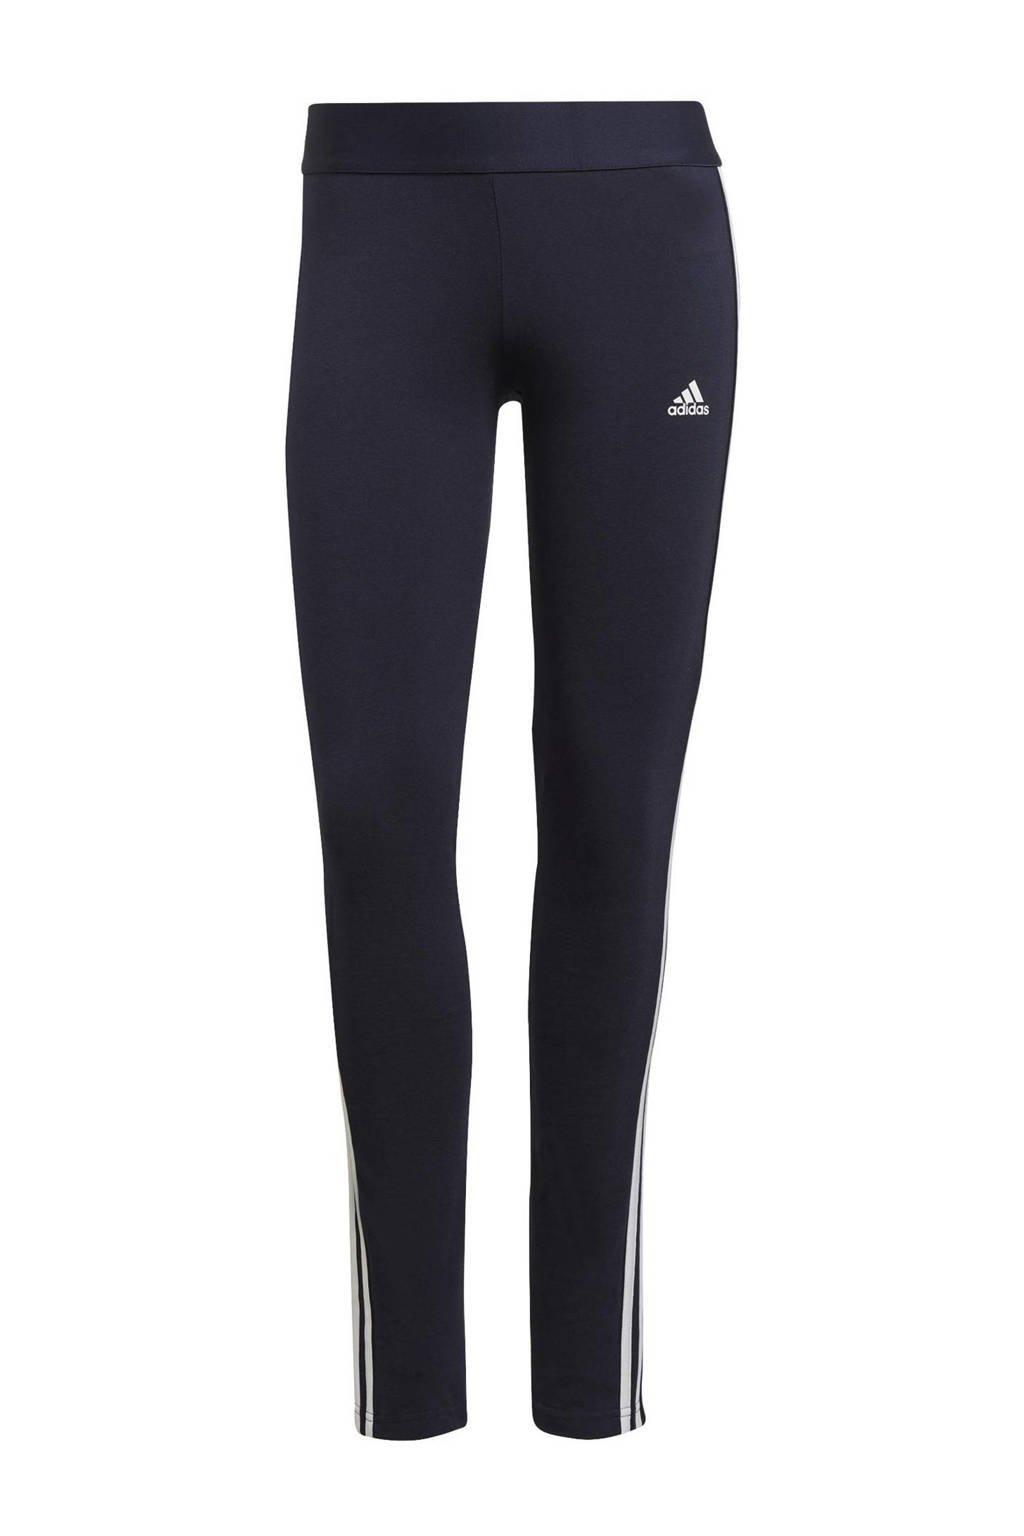 adidas Performance sportlegging donkergrijs/roze, Donkerblauw/wit